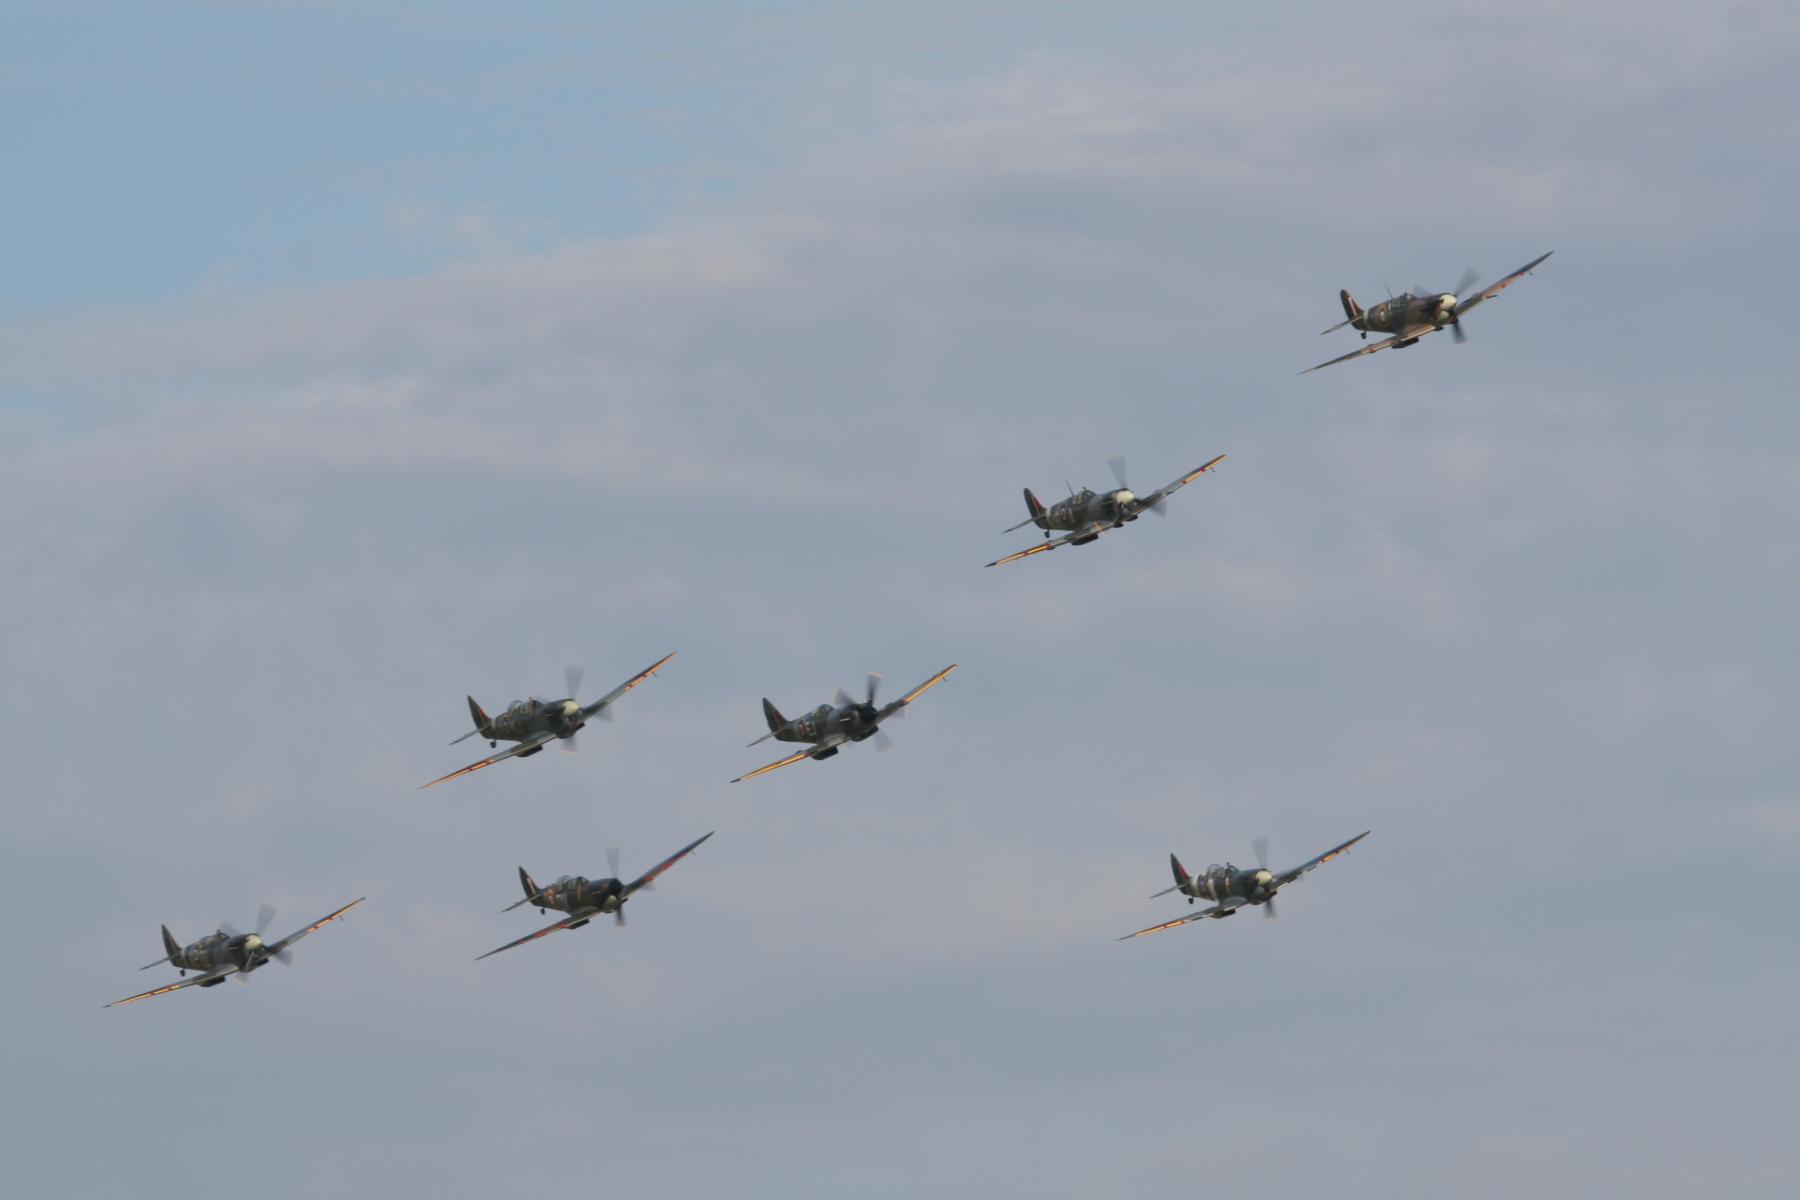 Duxford Summer Airshow 2011